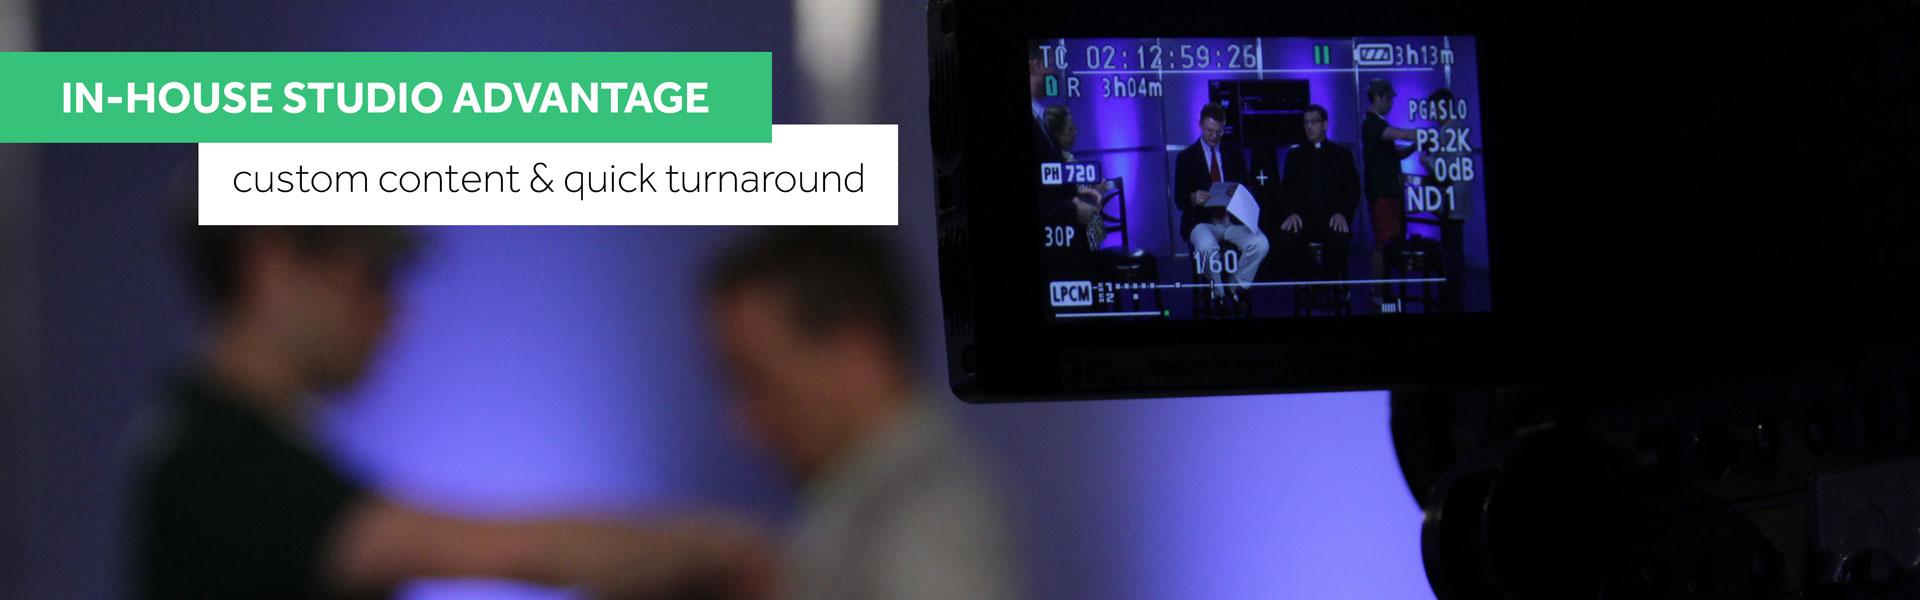 In-House Atlanta Georgia Video Production Studio Advantage with Custom Content and Quick Turnaround